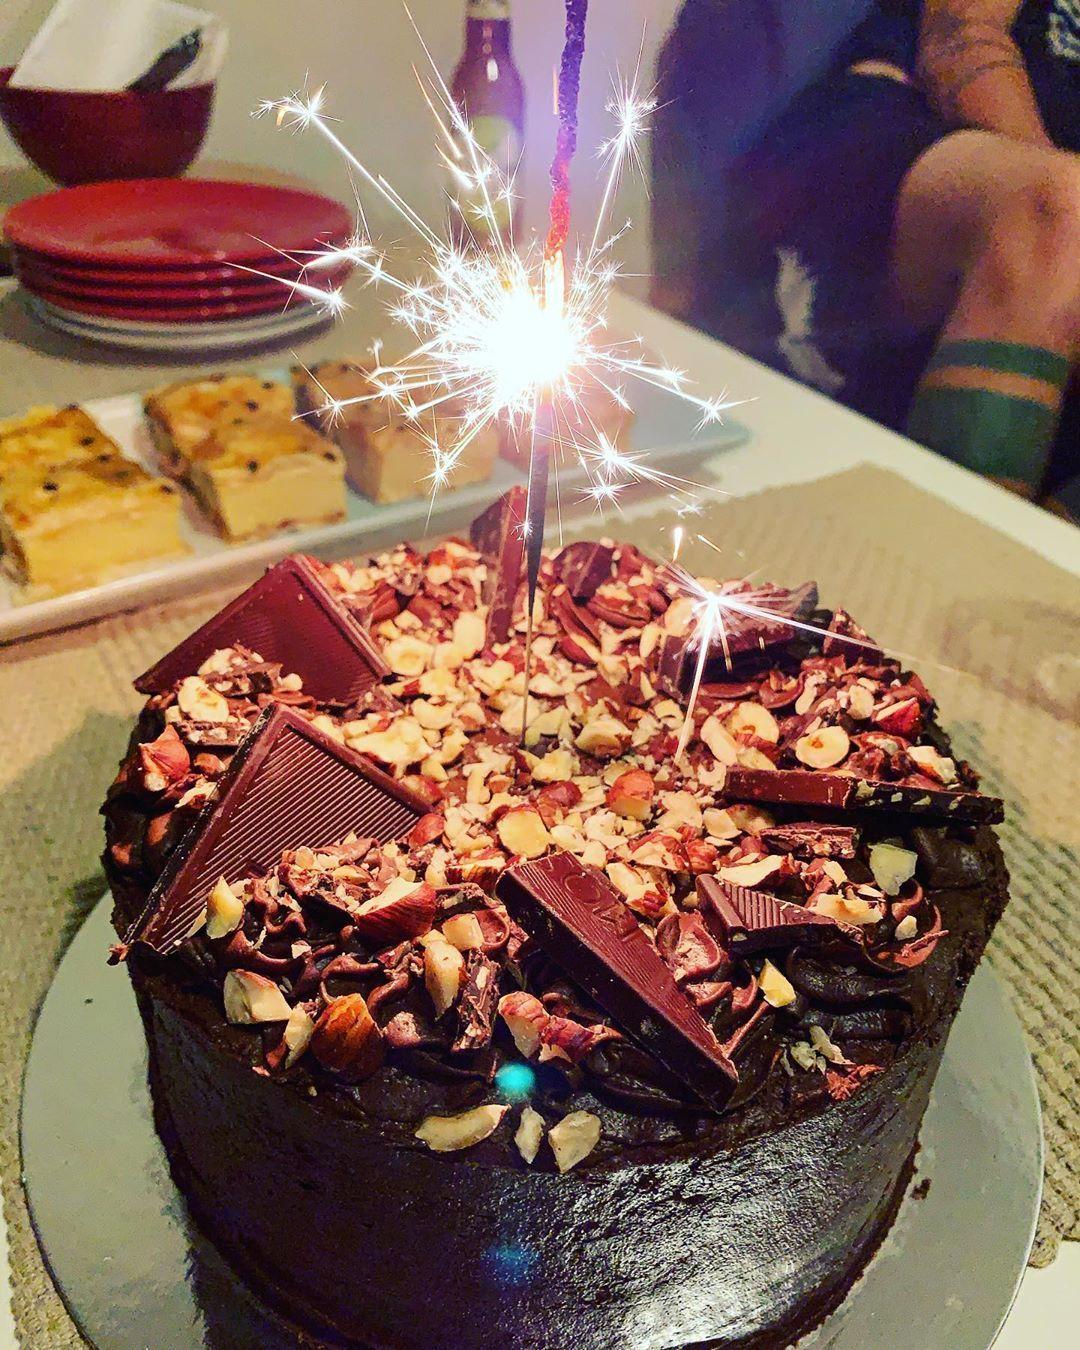 My birthday cake carrot hazelnut chocolate vegan of